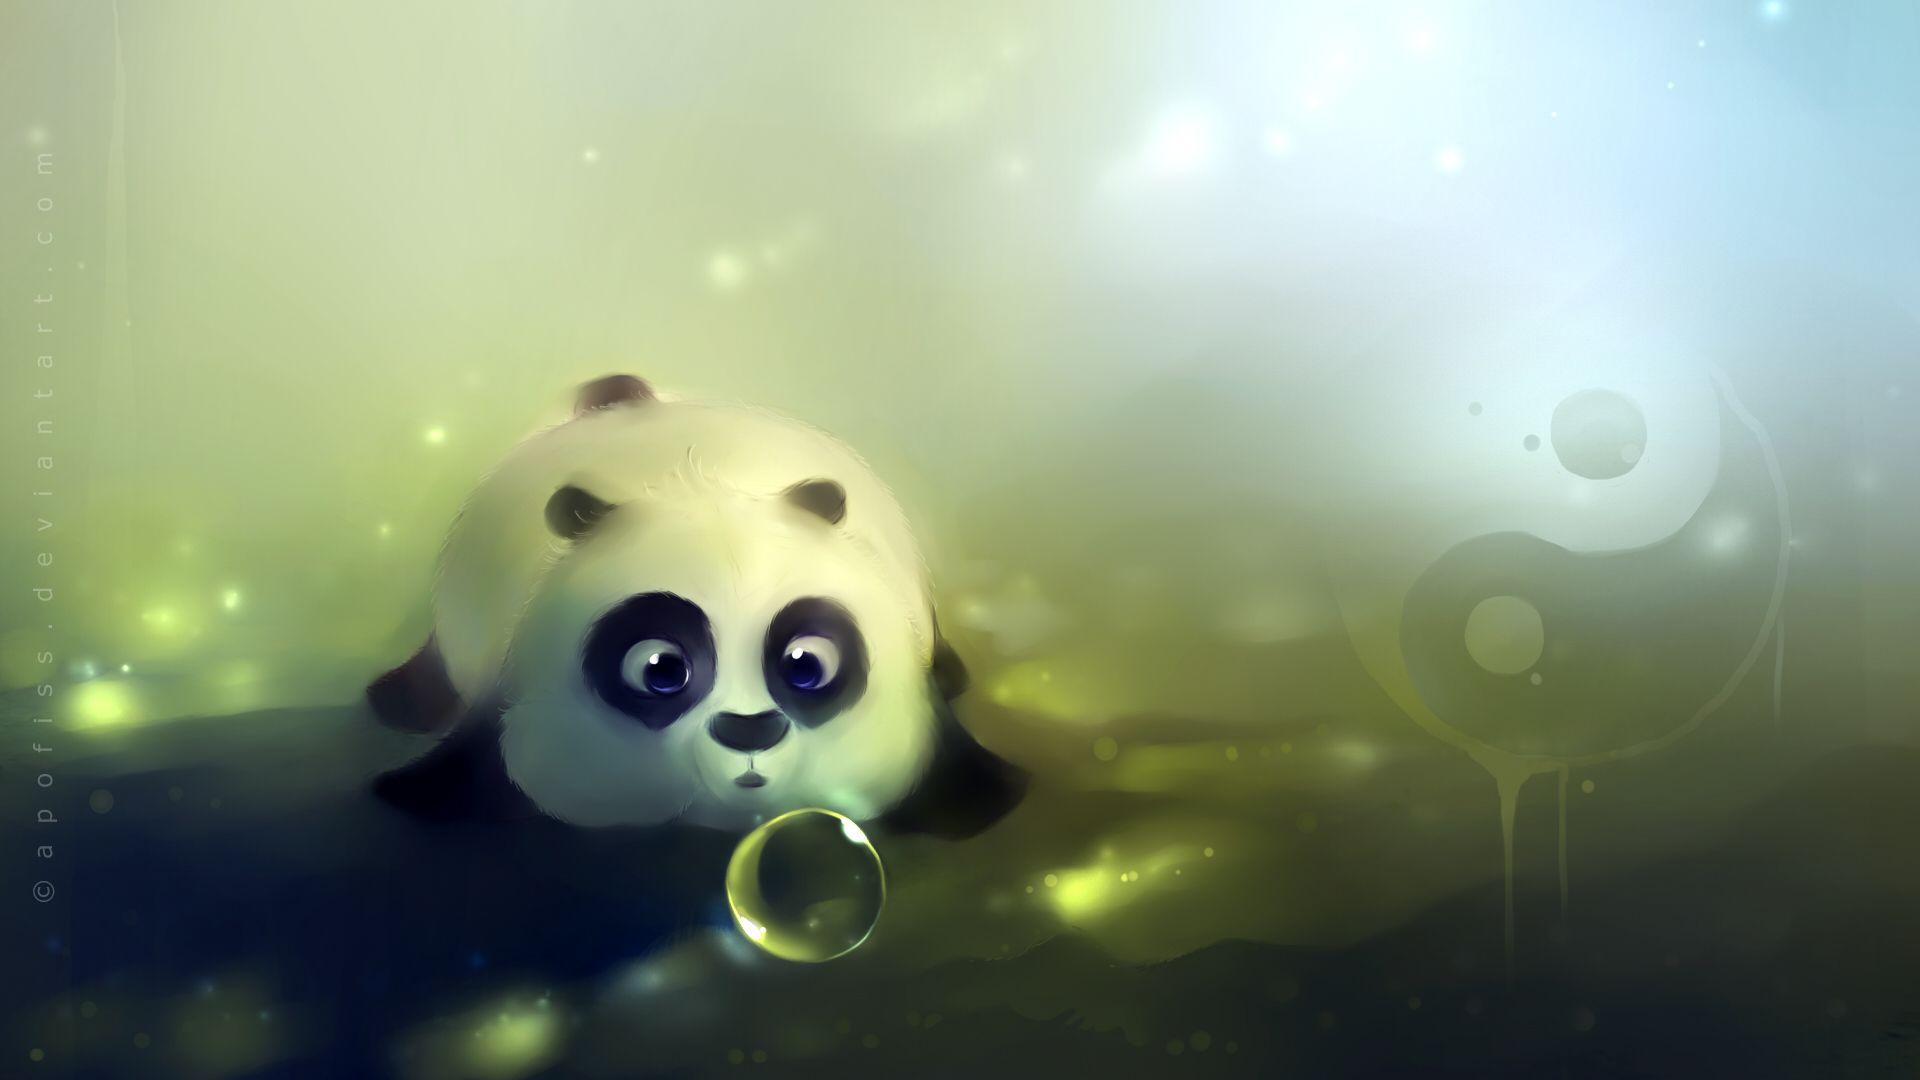 404 Not Found Cute Panda Wallpaper Panda Wallpapers Cute Cat Illustration